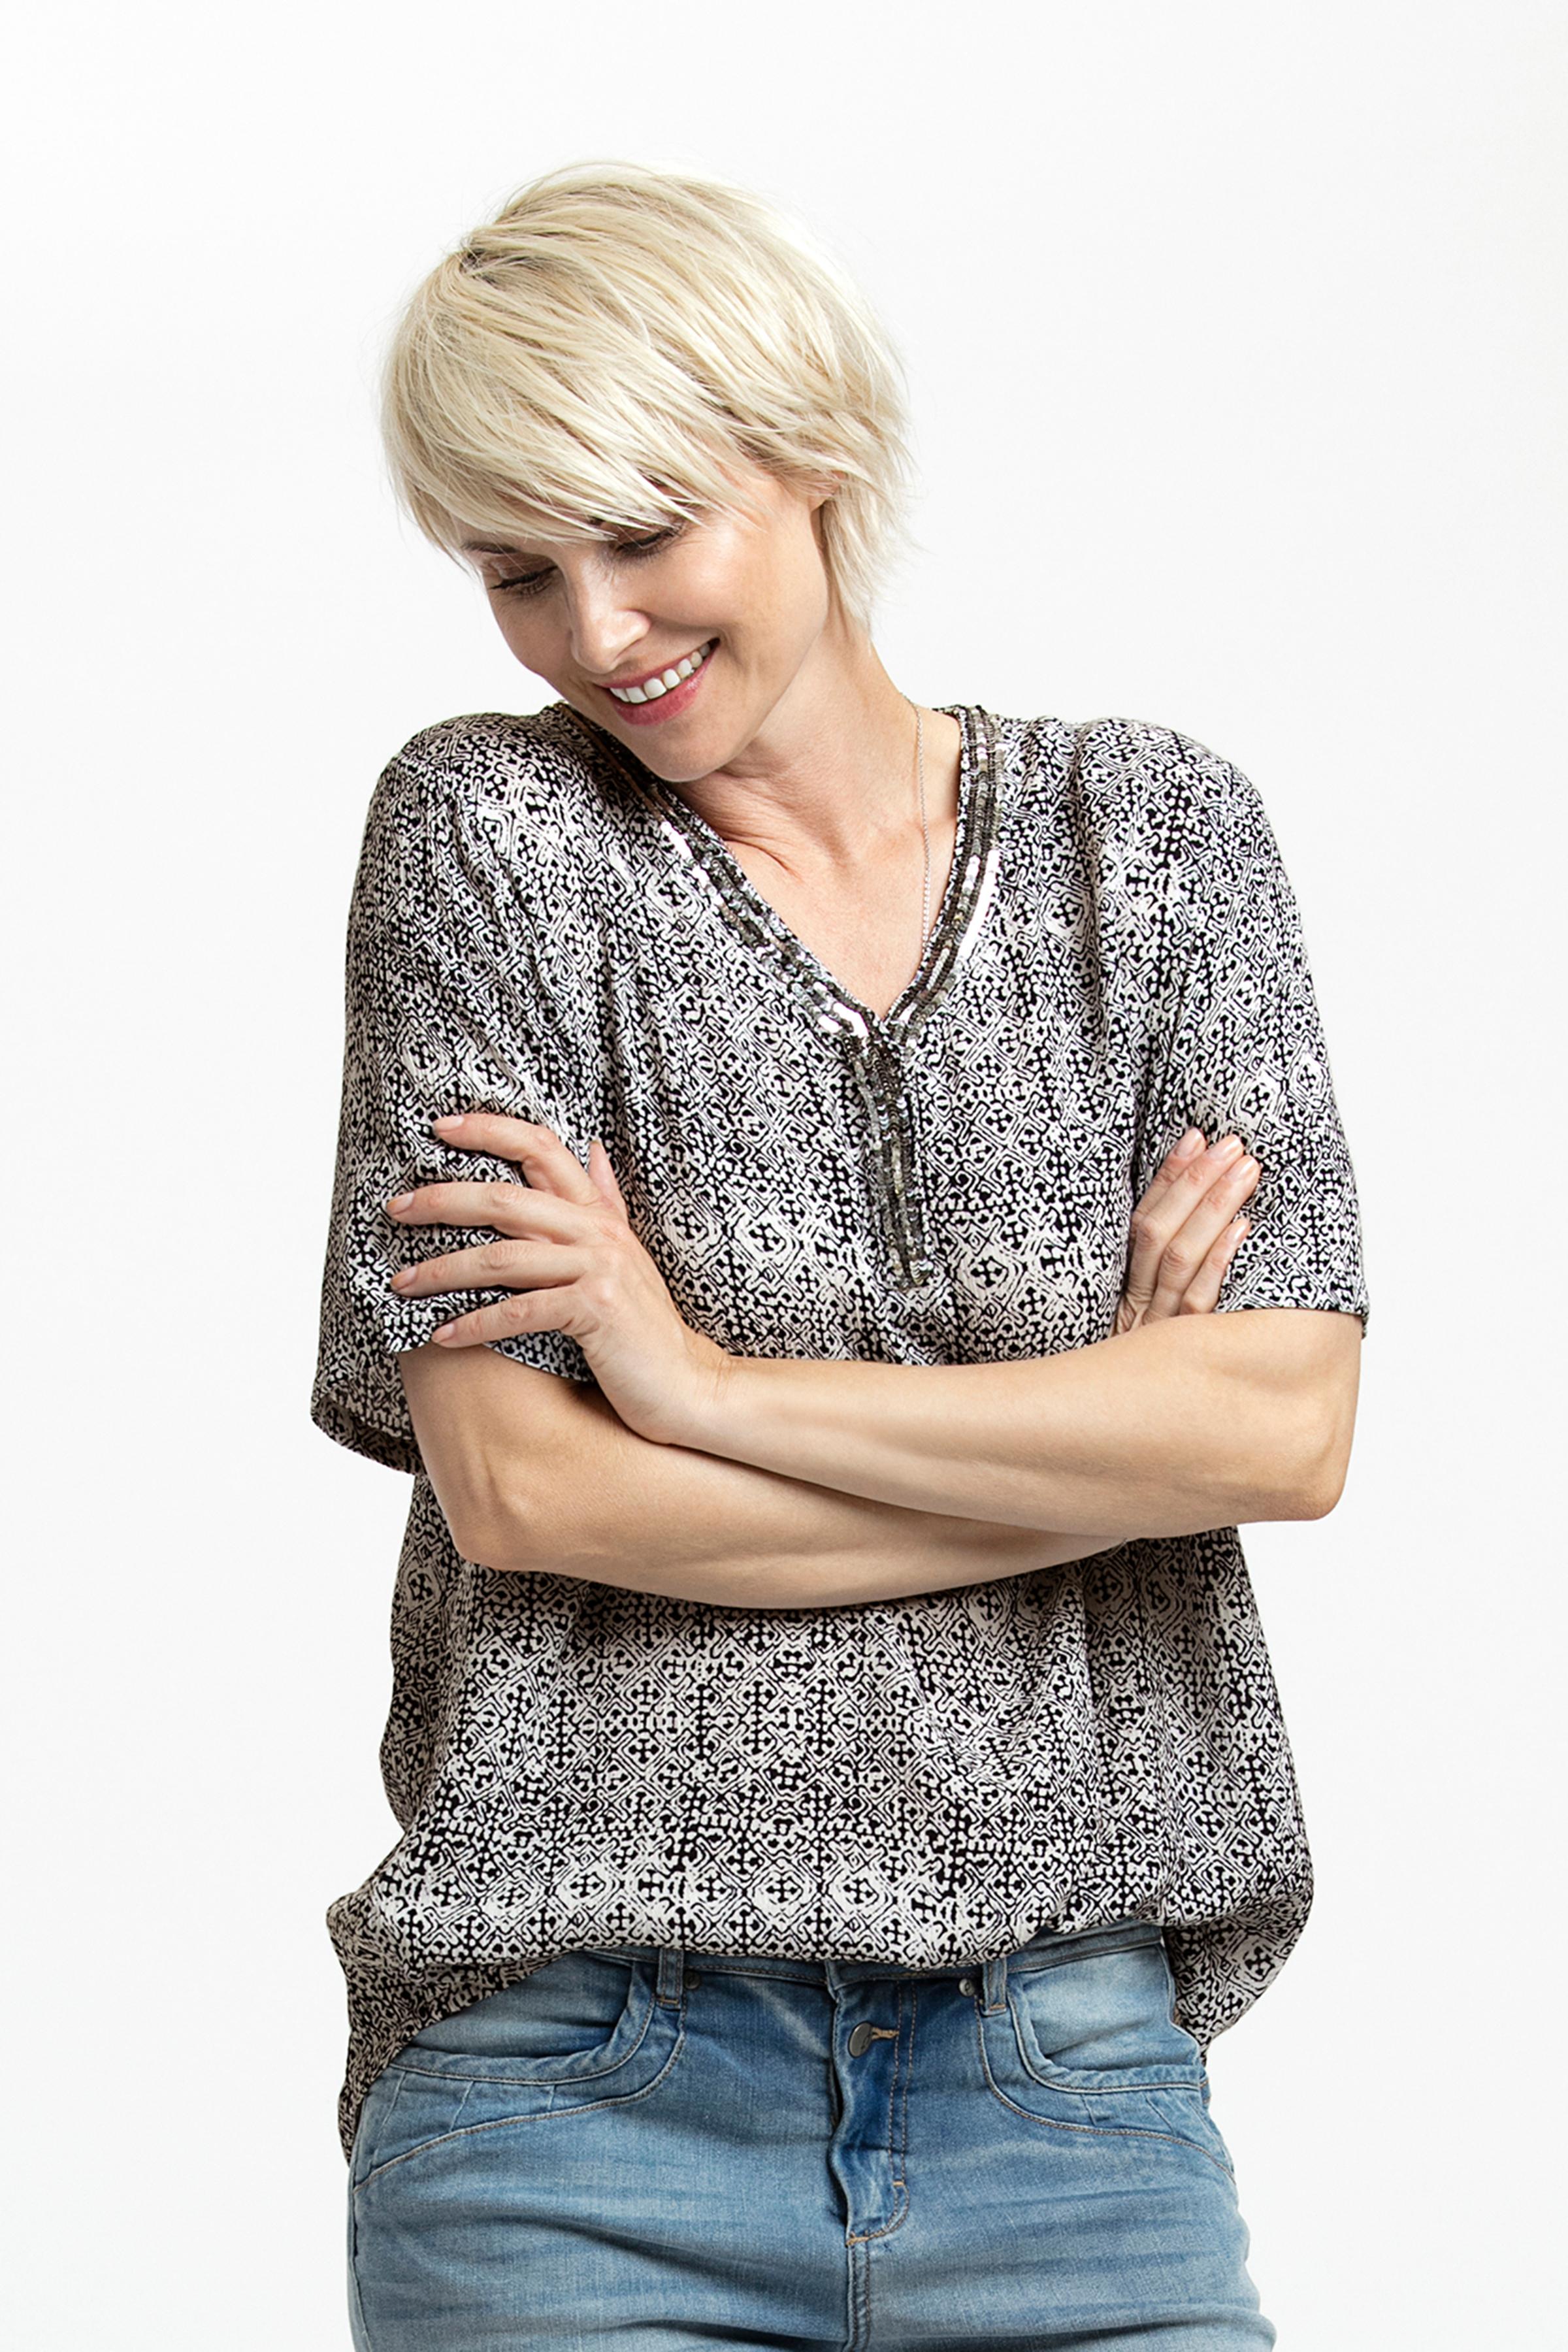 Marineblau Kurzarm-Bluse von Kaffe – Shoppen SieMarineblau Kurzarm-Bluse ab Gr. 34-46 hier